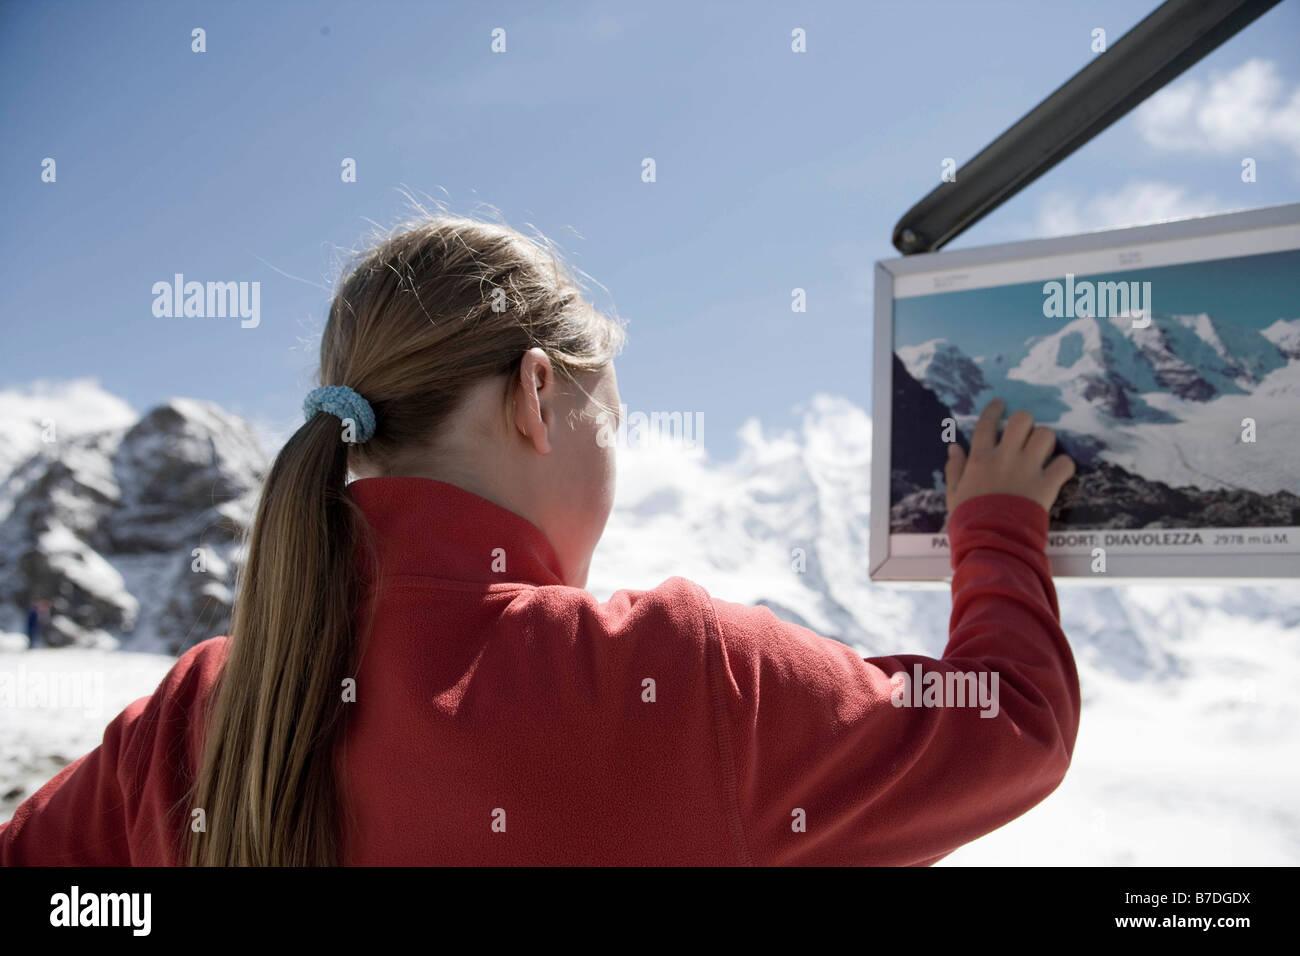 girl looking around in mountainous area - Stock Image